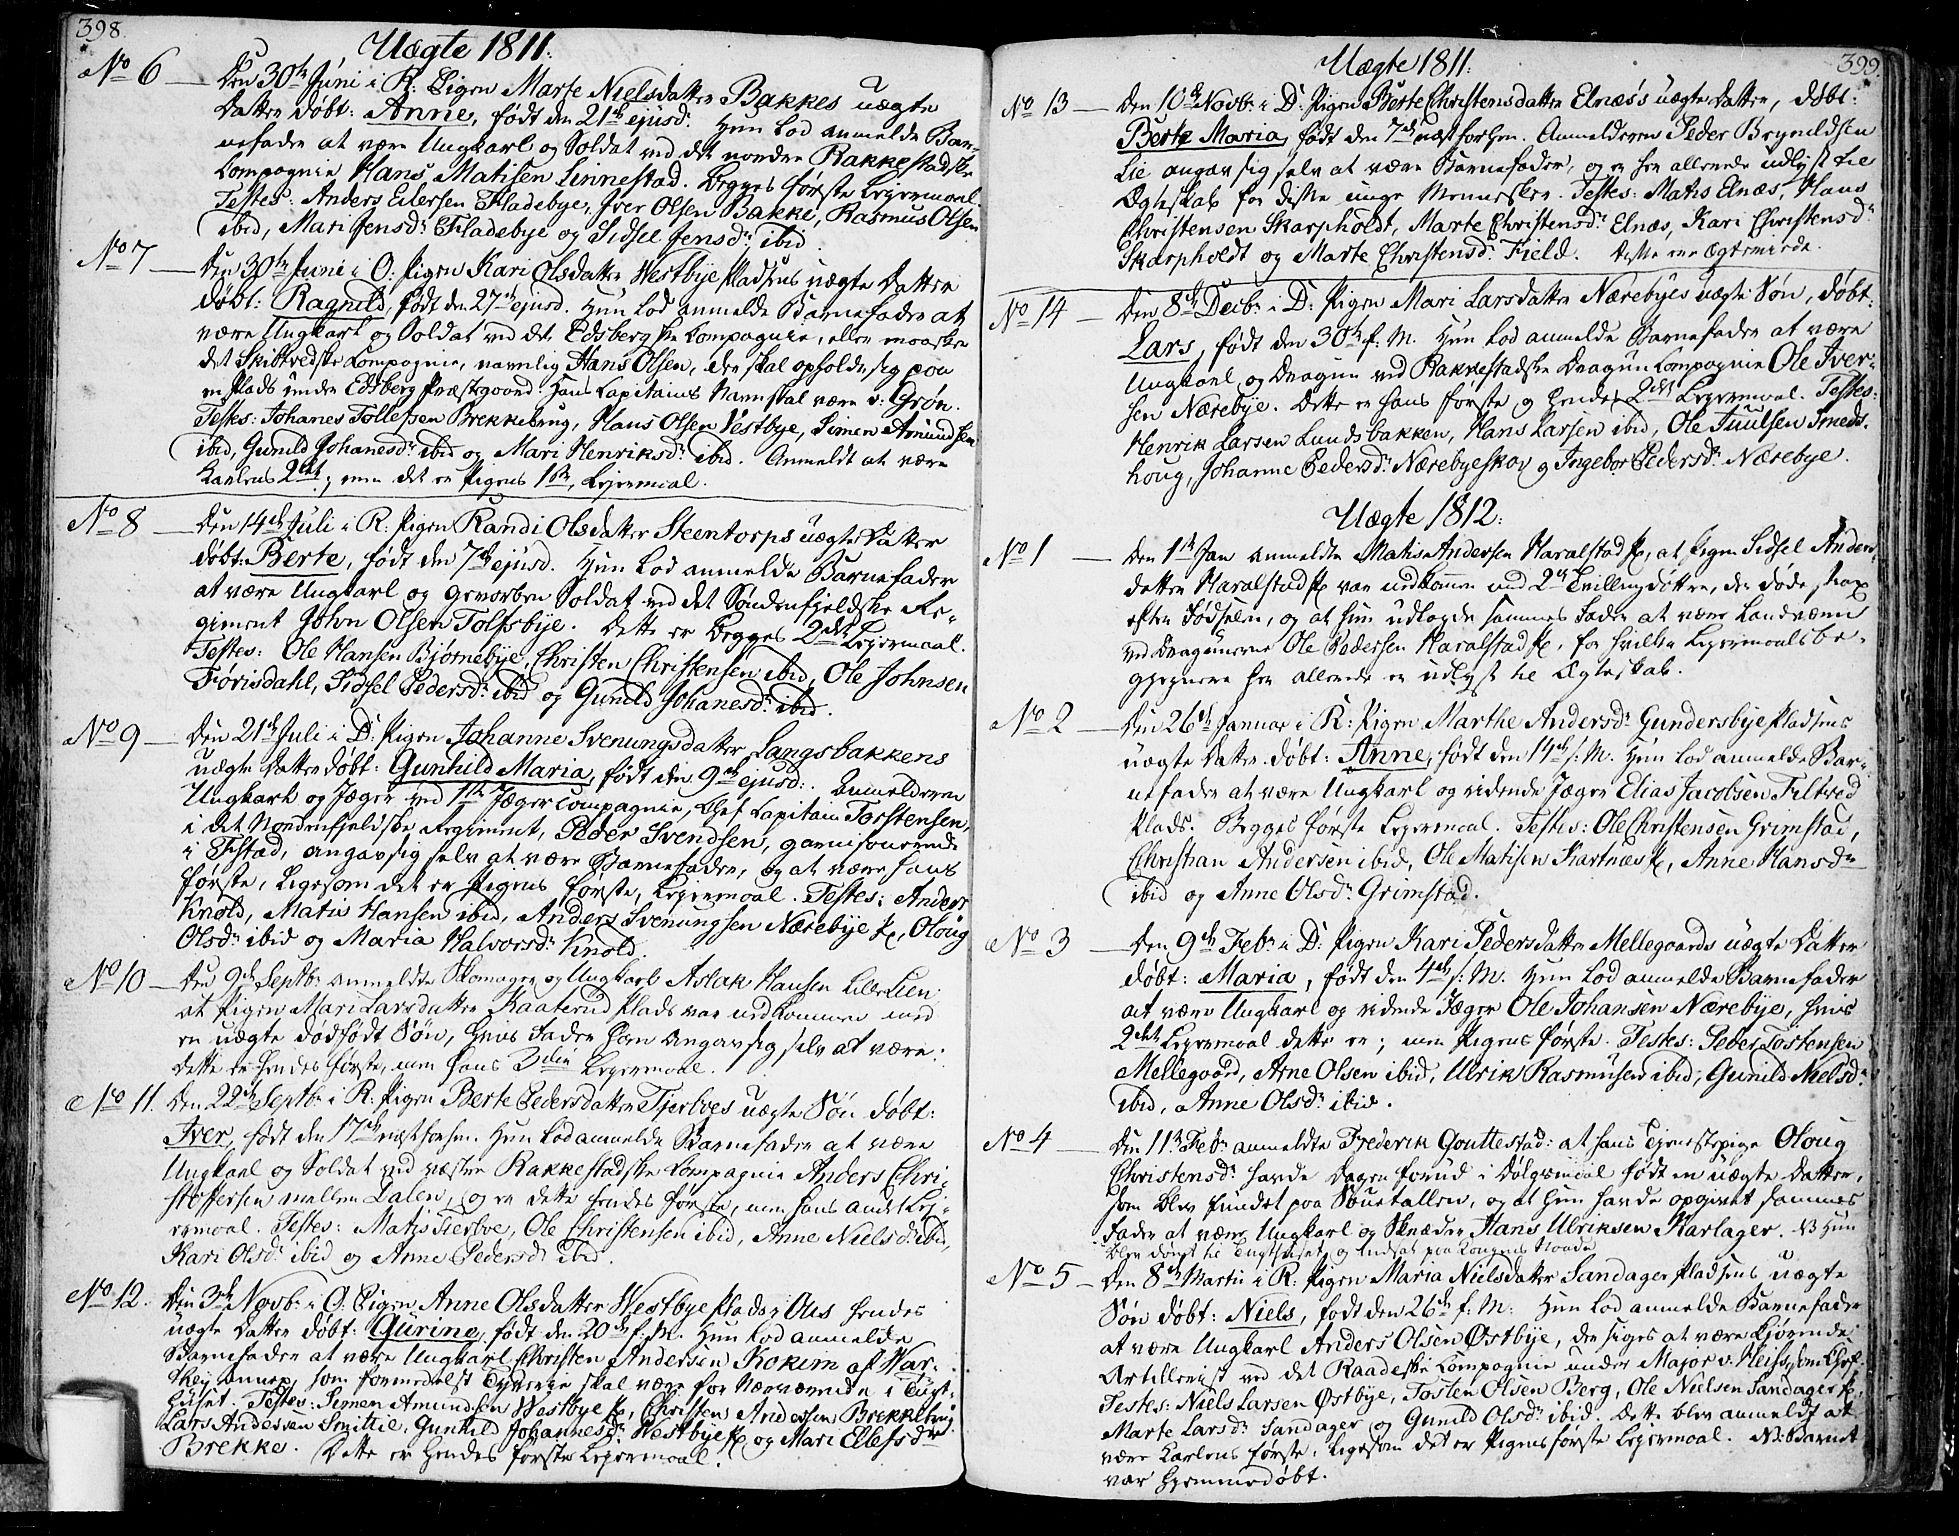 SAO, Rakkestad prestekontor Kirkebøker, F/Fa/L0005: Parish register (official) no. I 5, 1784-1814, p. 398-399